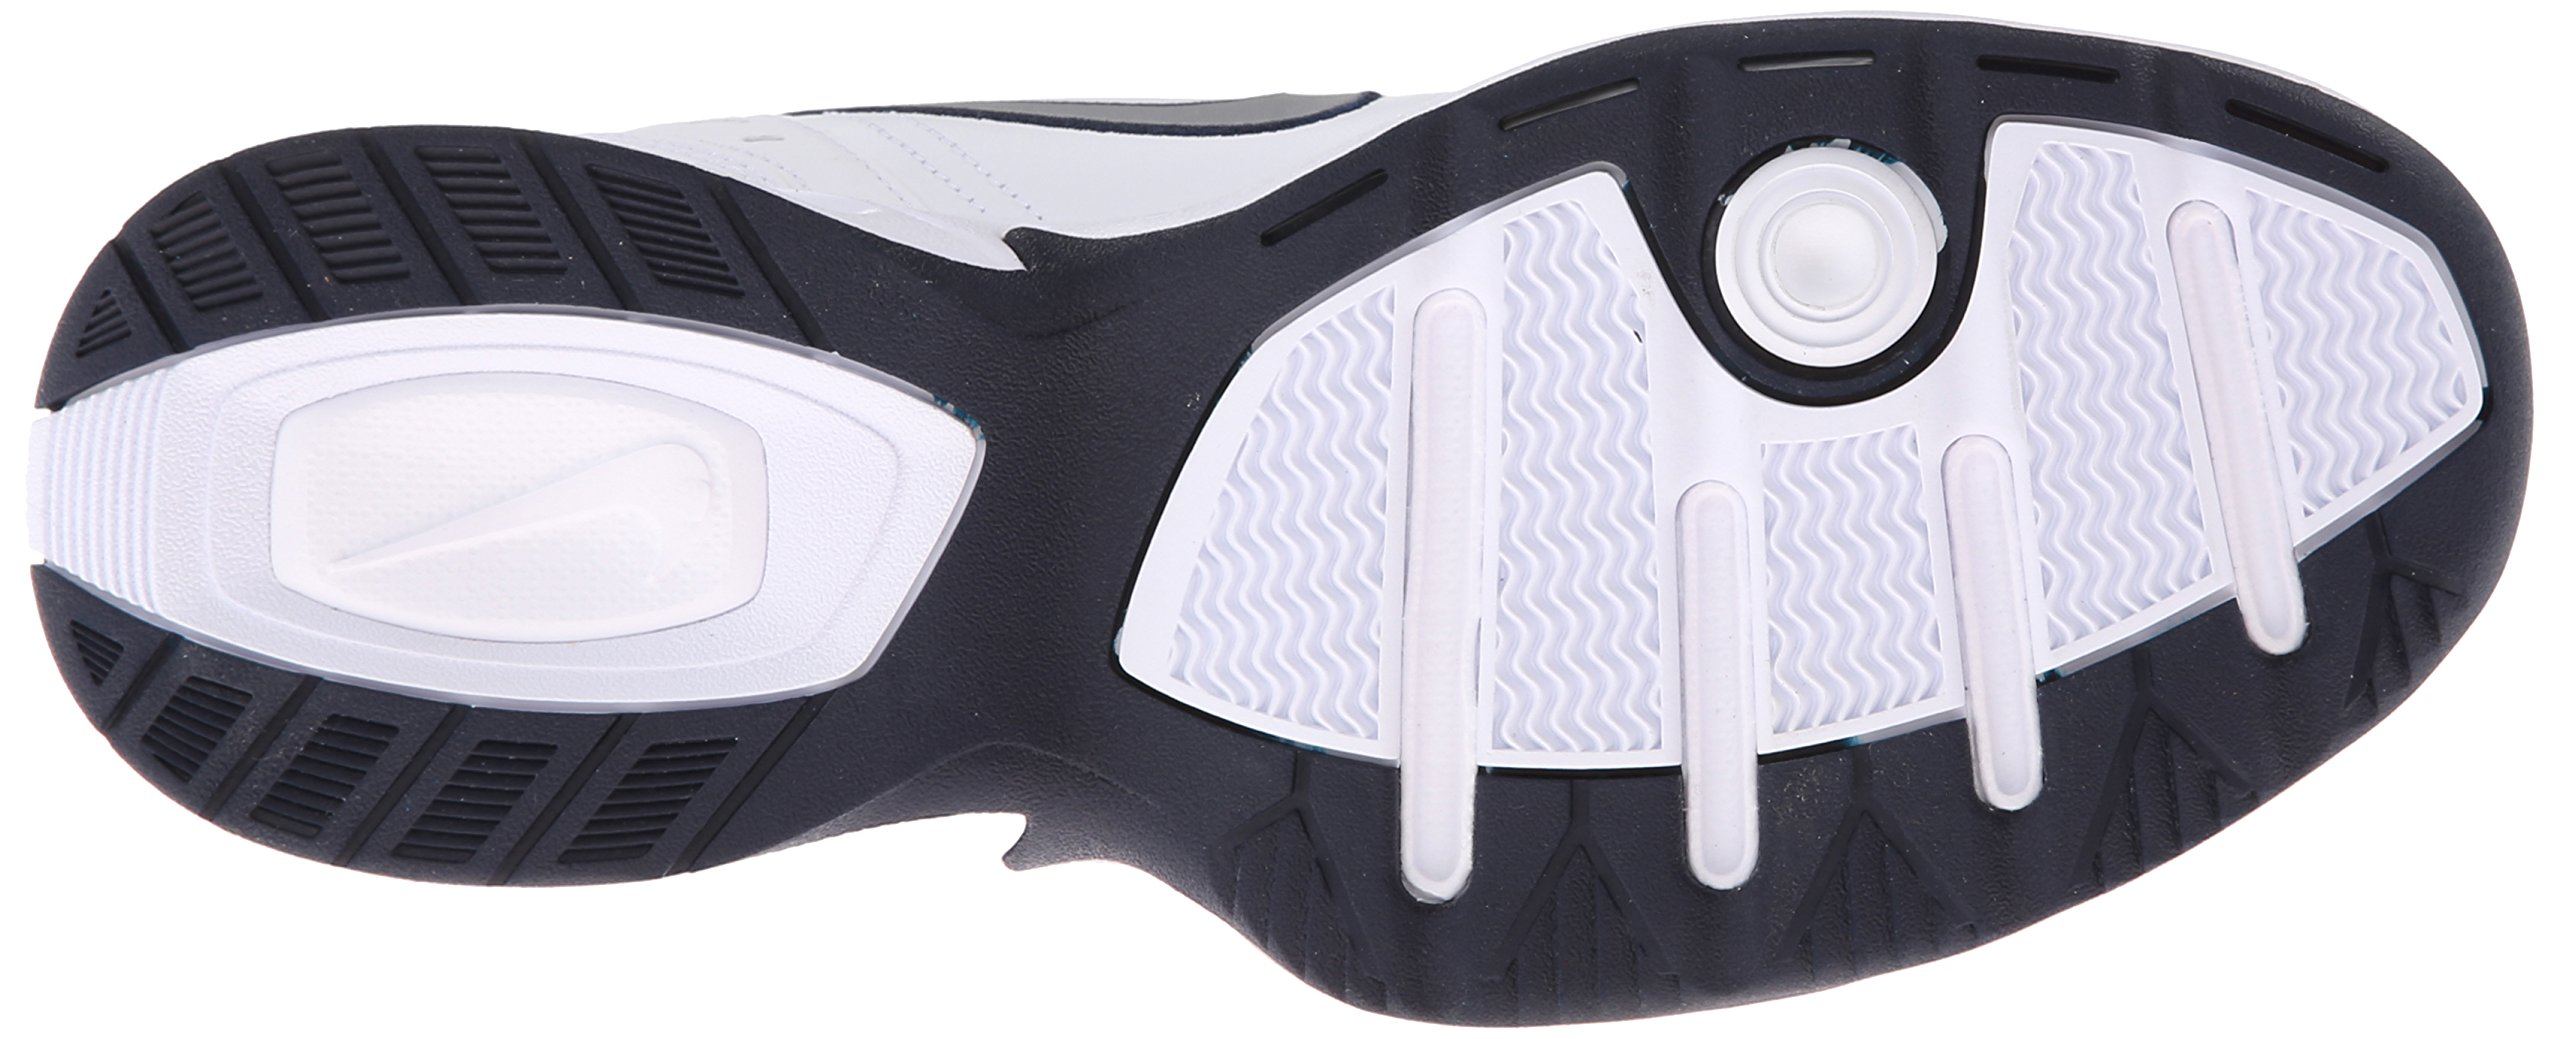 Nike-Men-039-s-Air-Monarch-IV-Cross-Trainer-Sneaker-416355 thumbnail 20